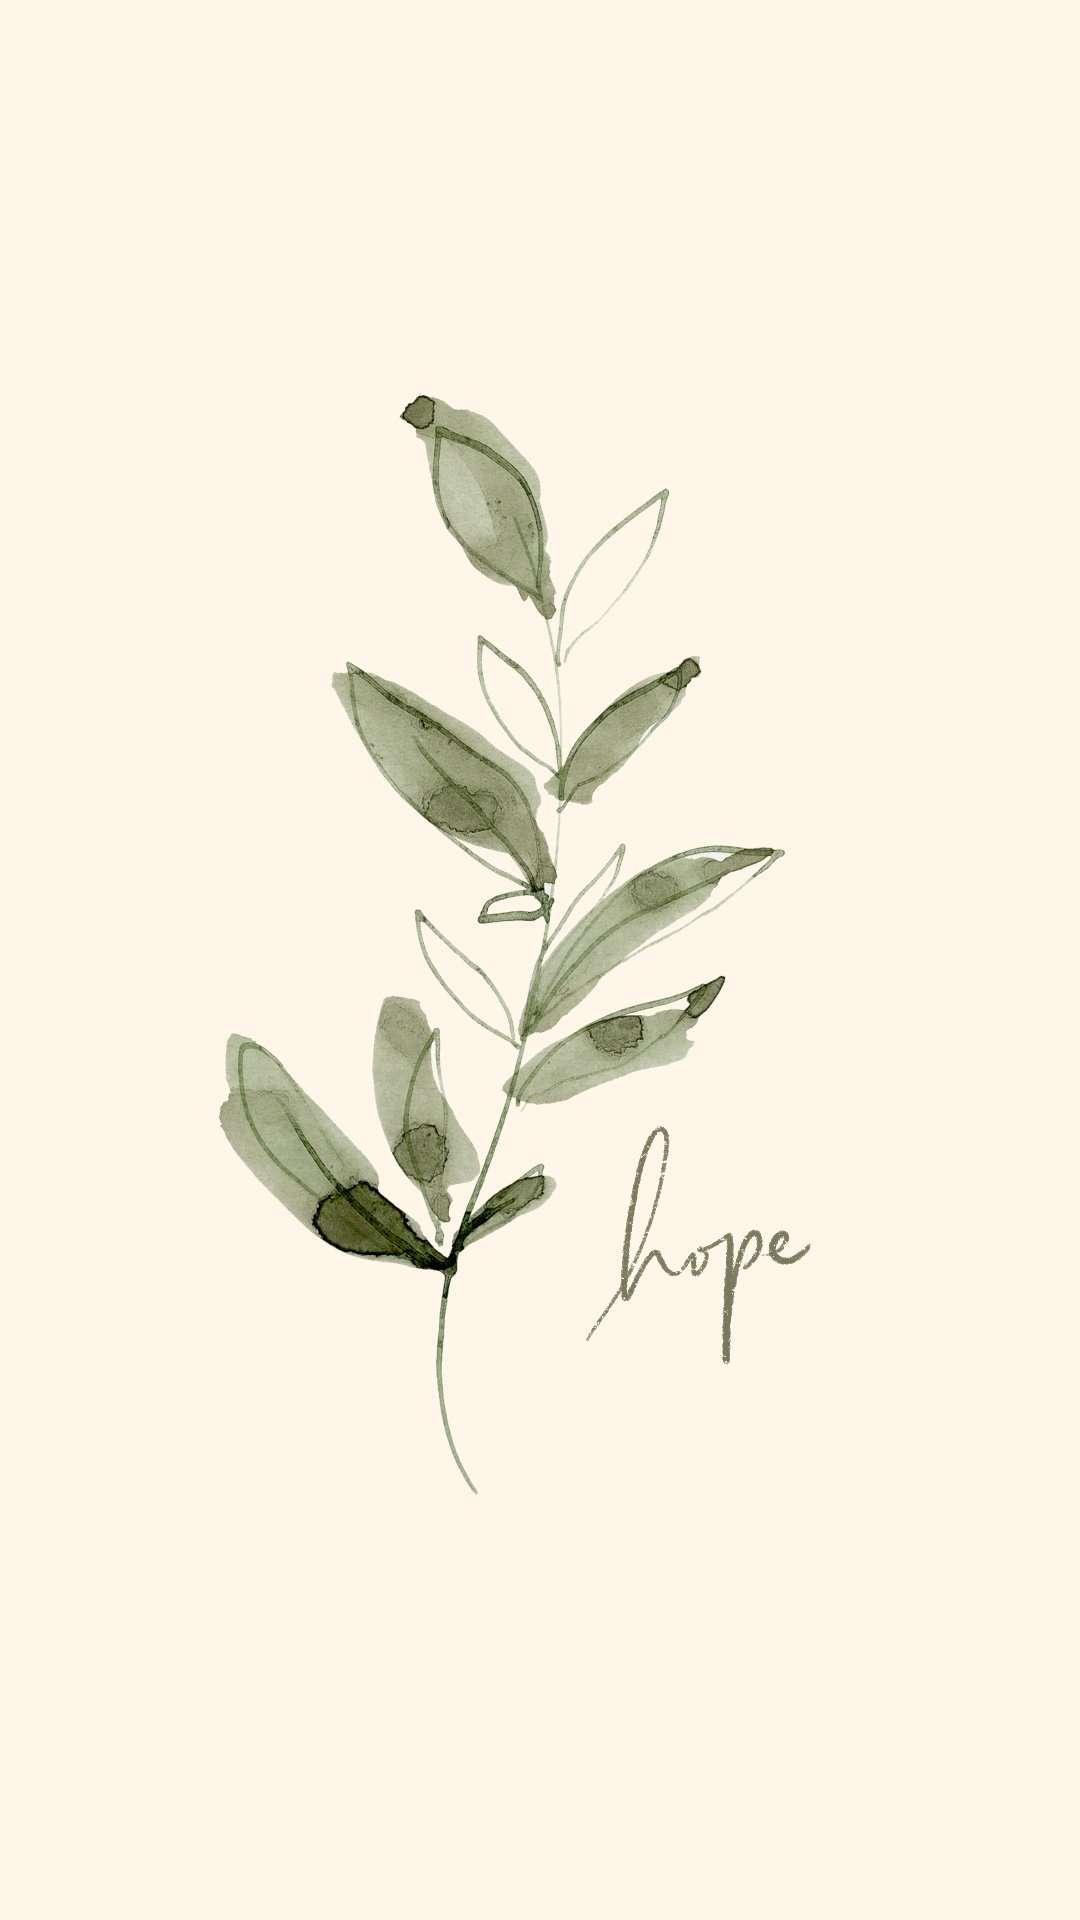 Watercolor Botanical iPhone Wallpaper, Free Mobile Screensaver Lockscreen, Watercolor Greenery Artwork Hope Motivation Inspirational Quote from Essem Creatives